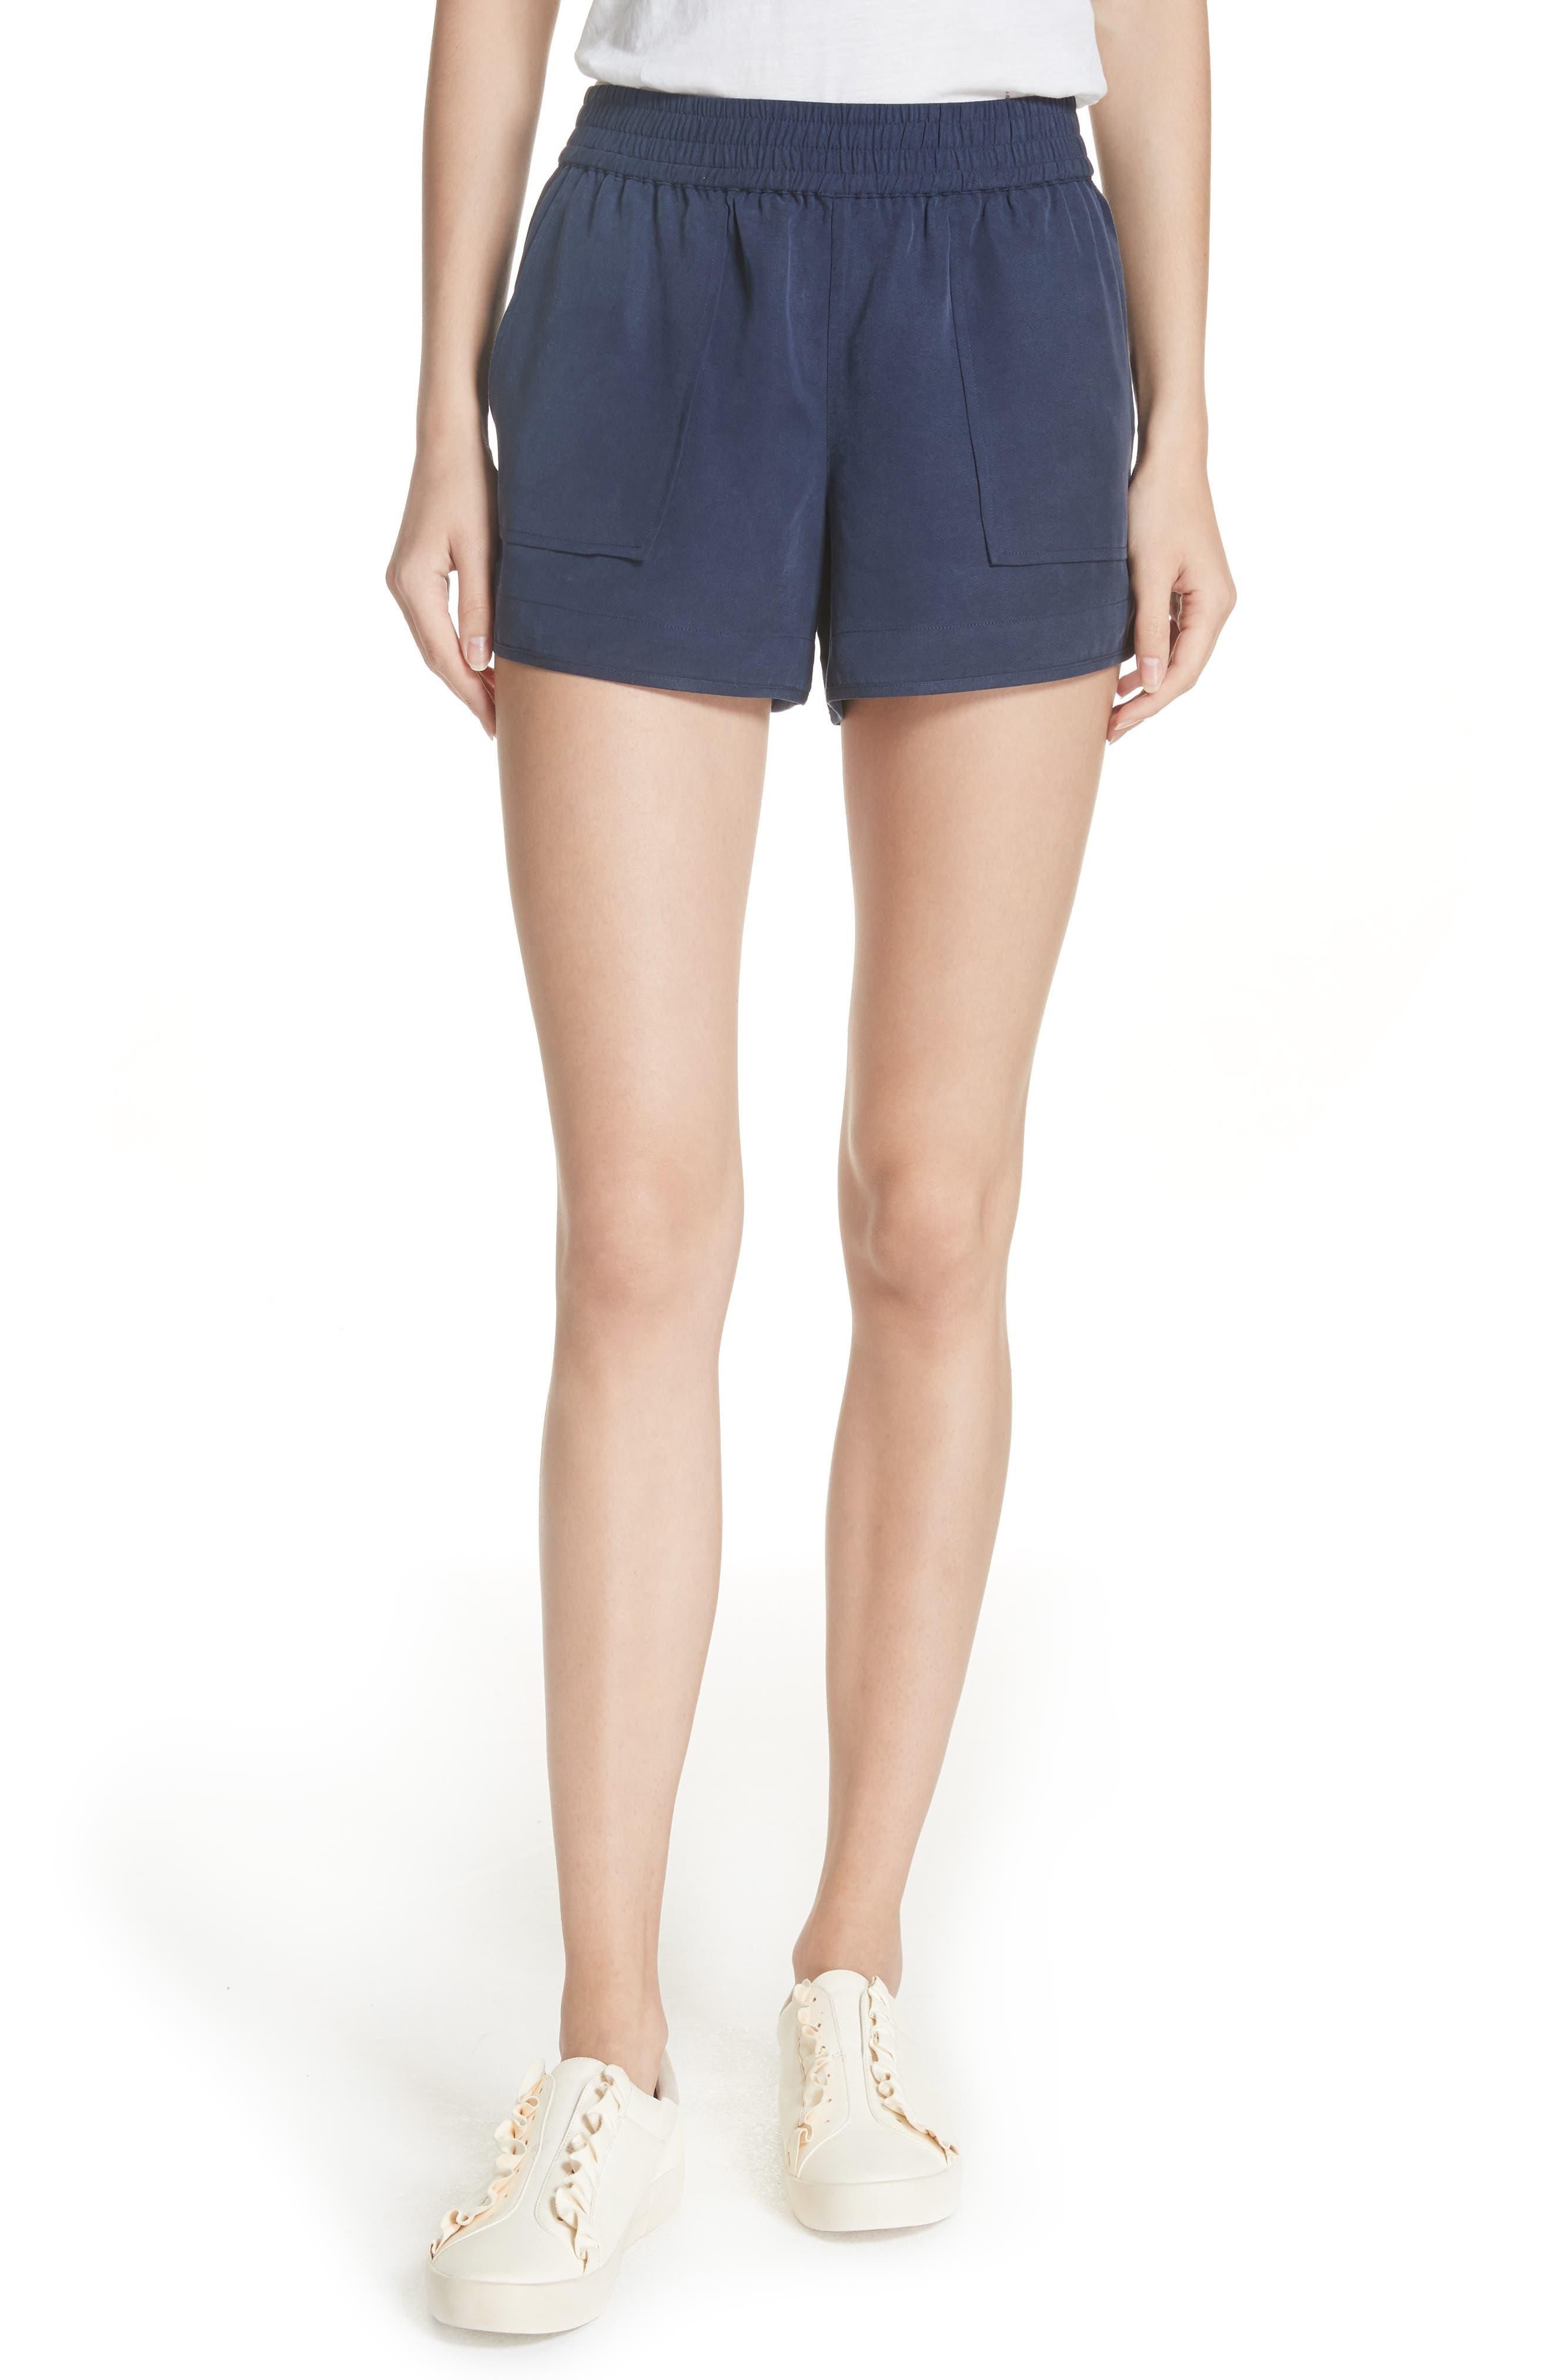 Beso Shorts,                         Main,                         color, 418